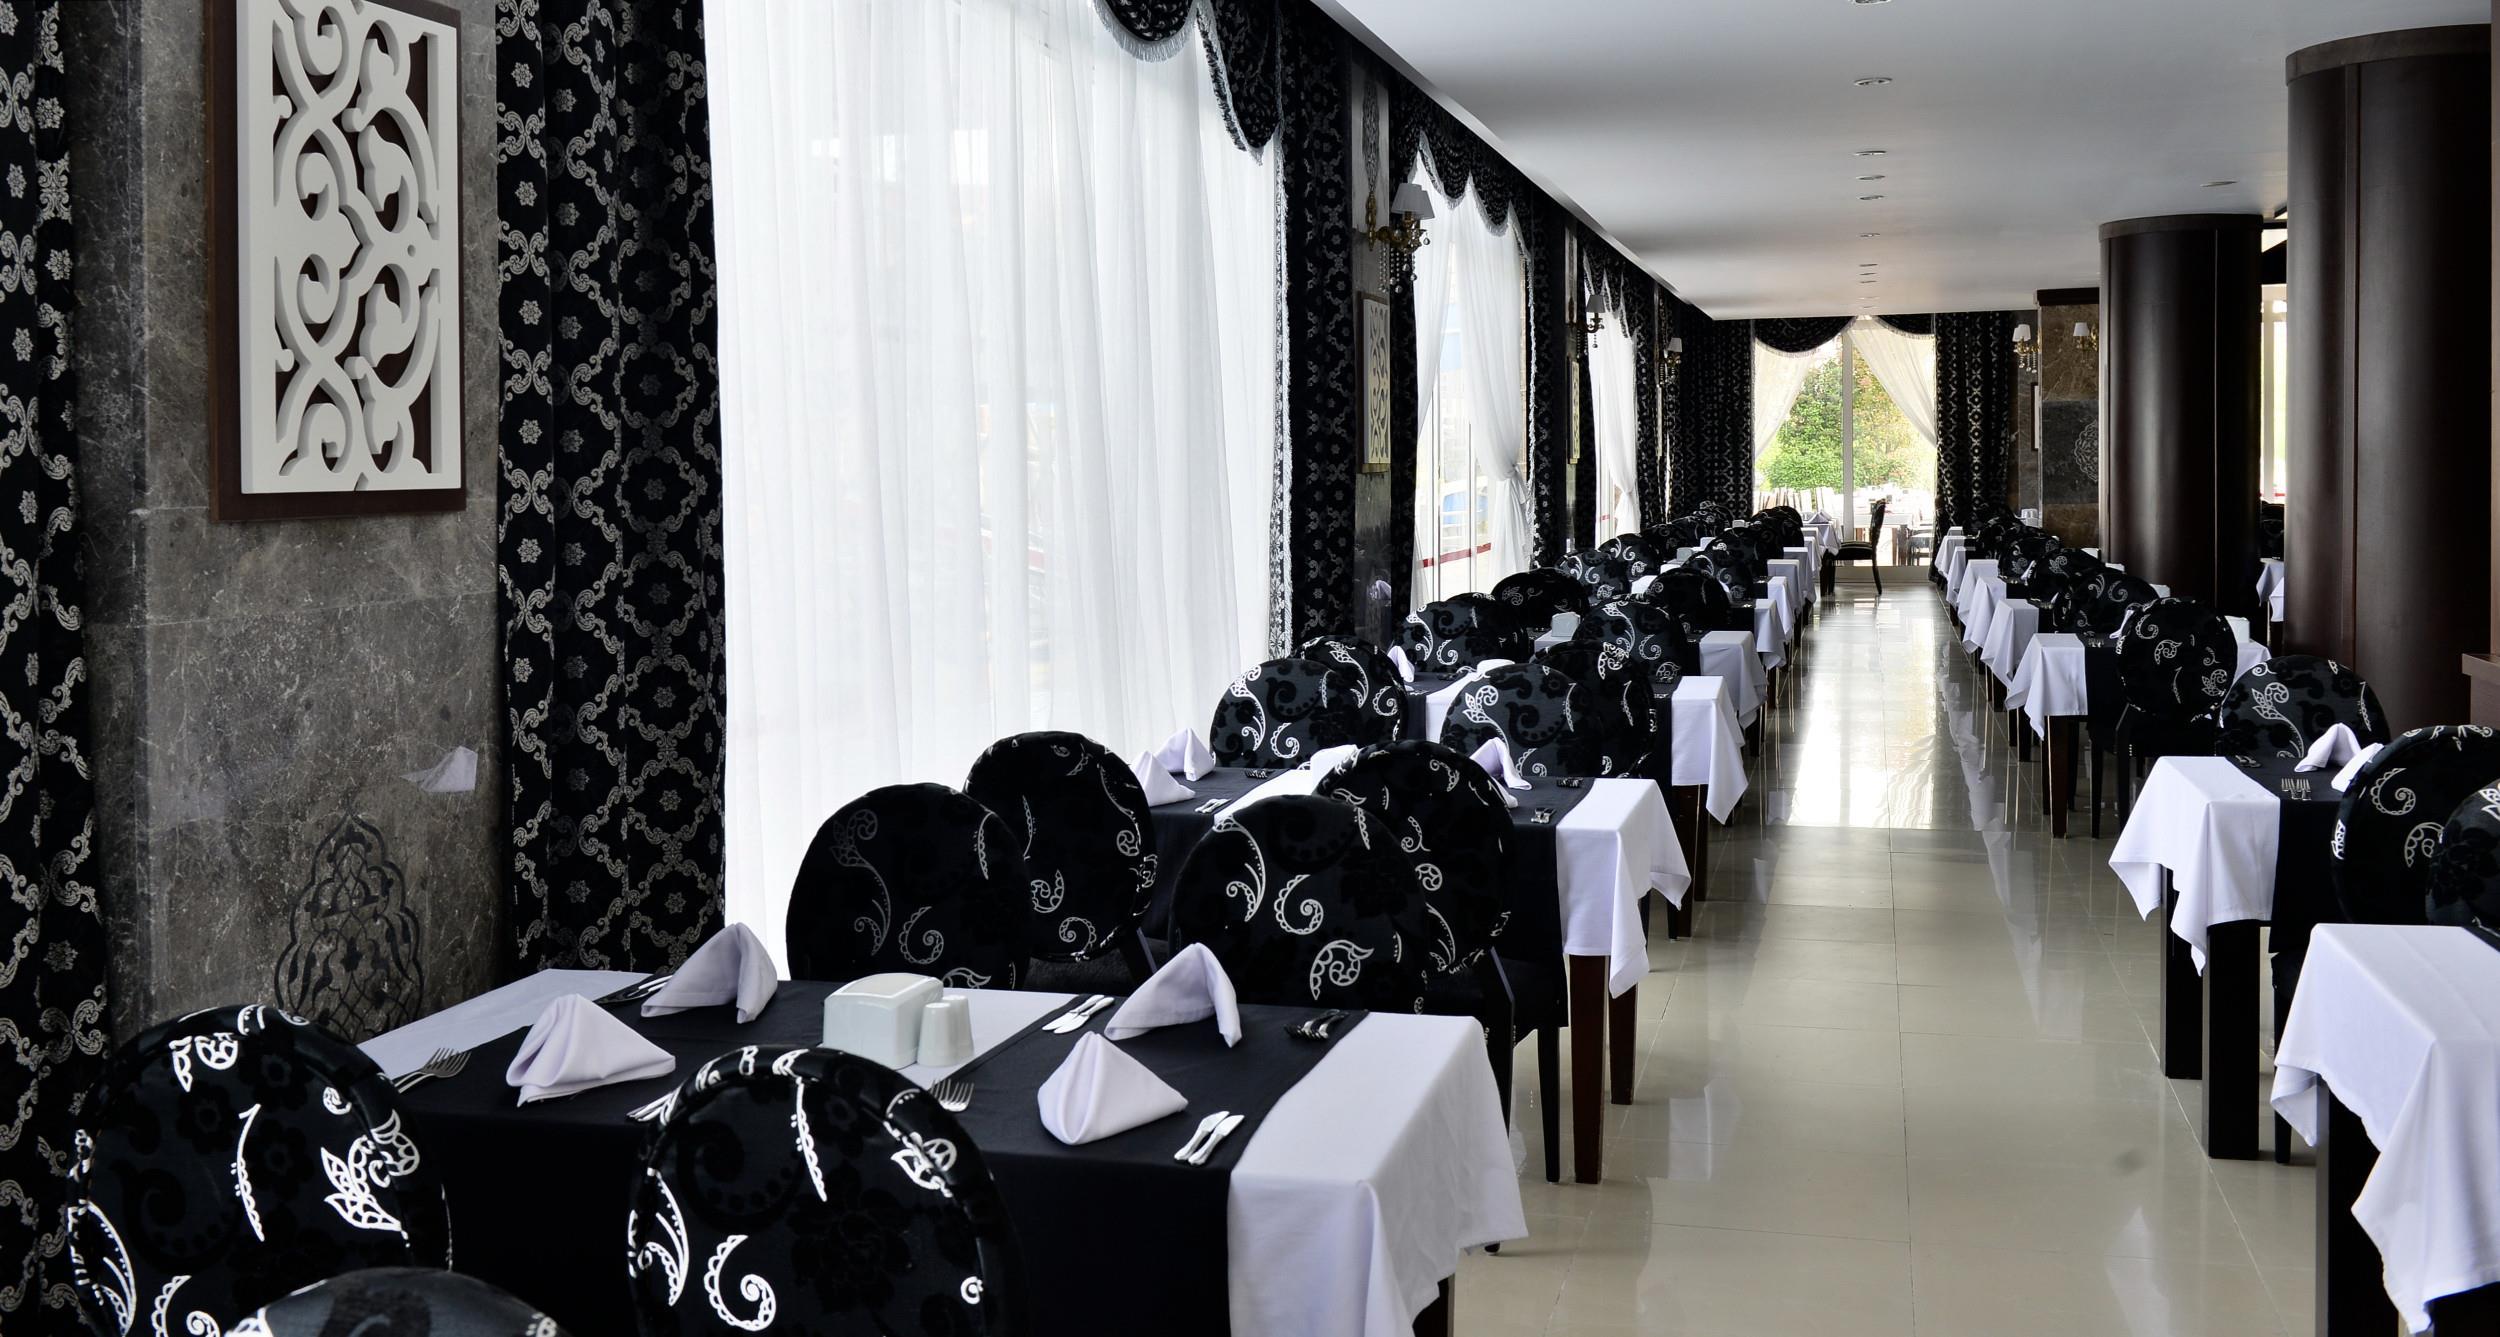 http://www.orextravel.sk/OREX/hotelphotos/side-royal-paradise-general-0032.jpg